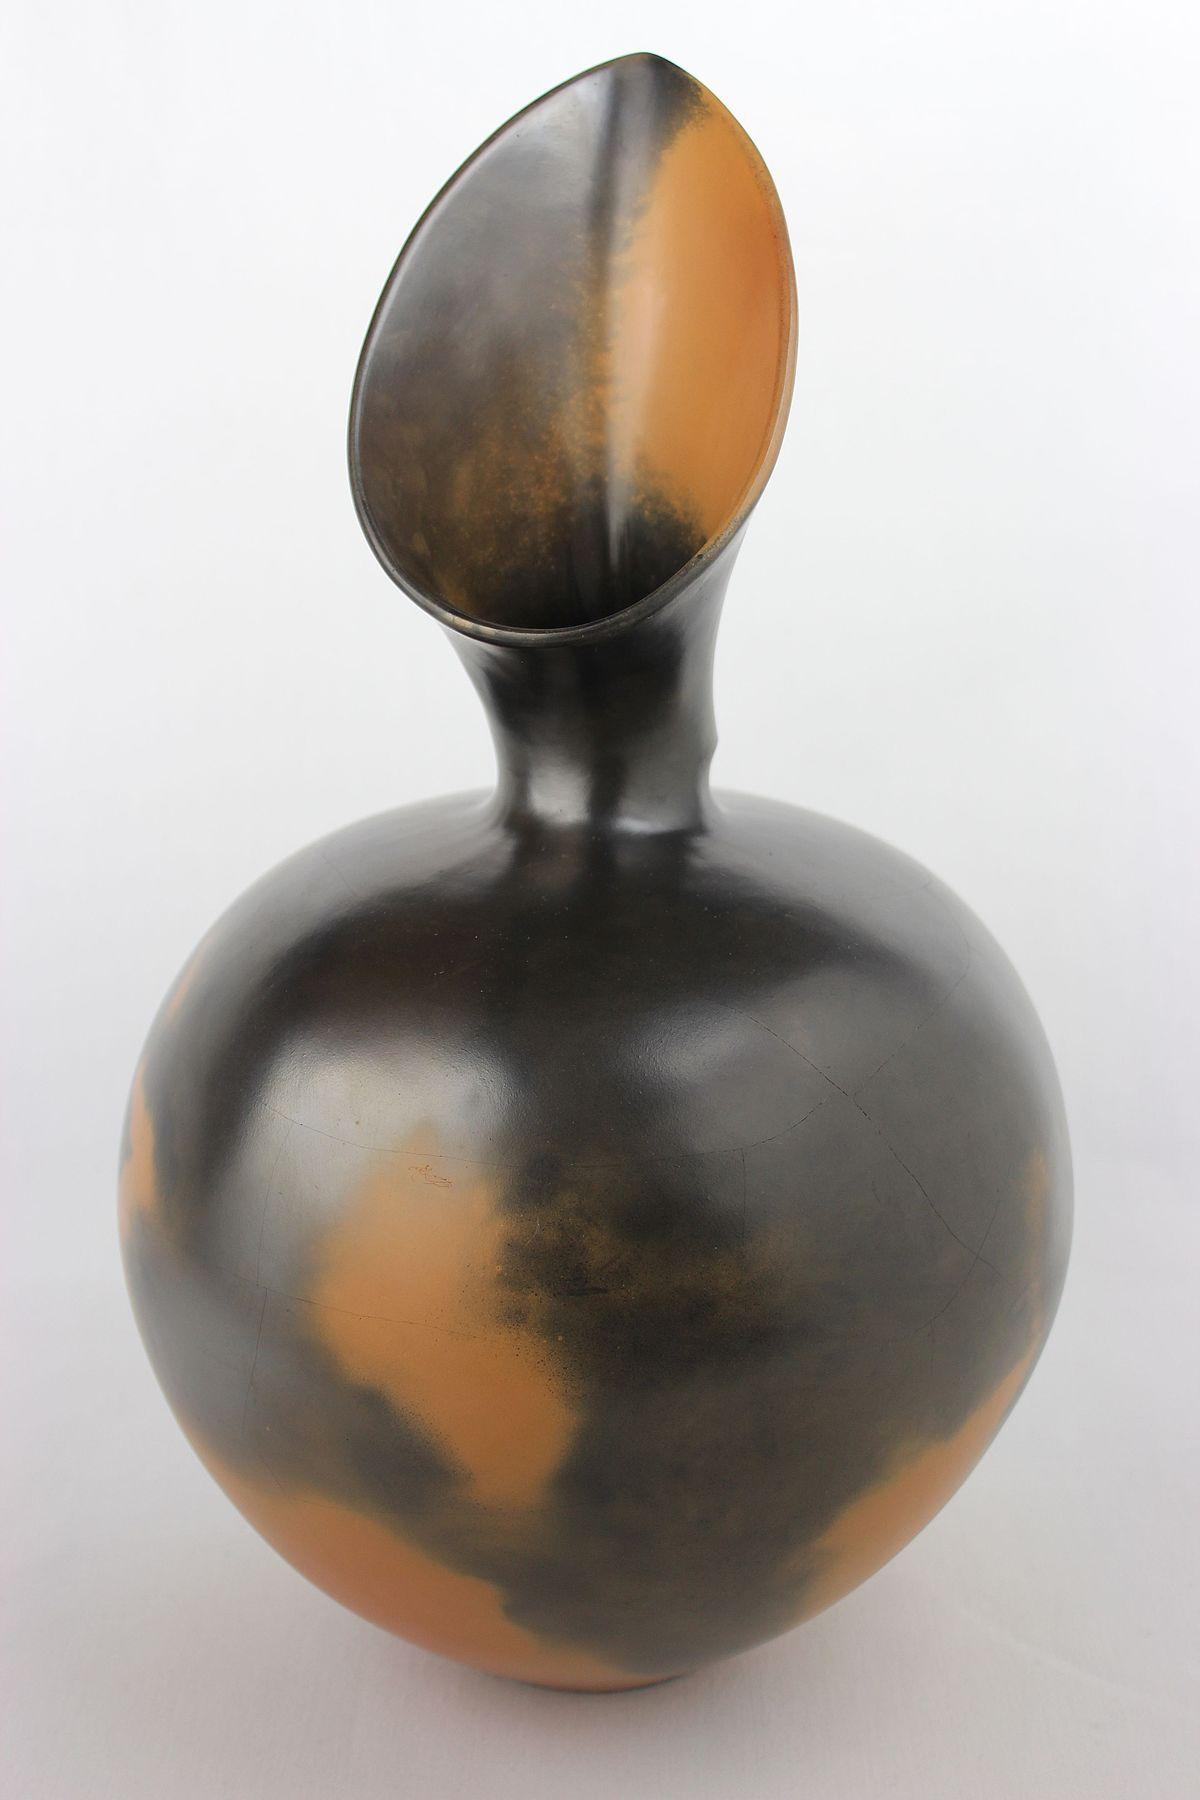 magdalene odundo wikipedia